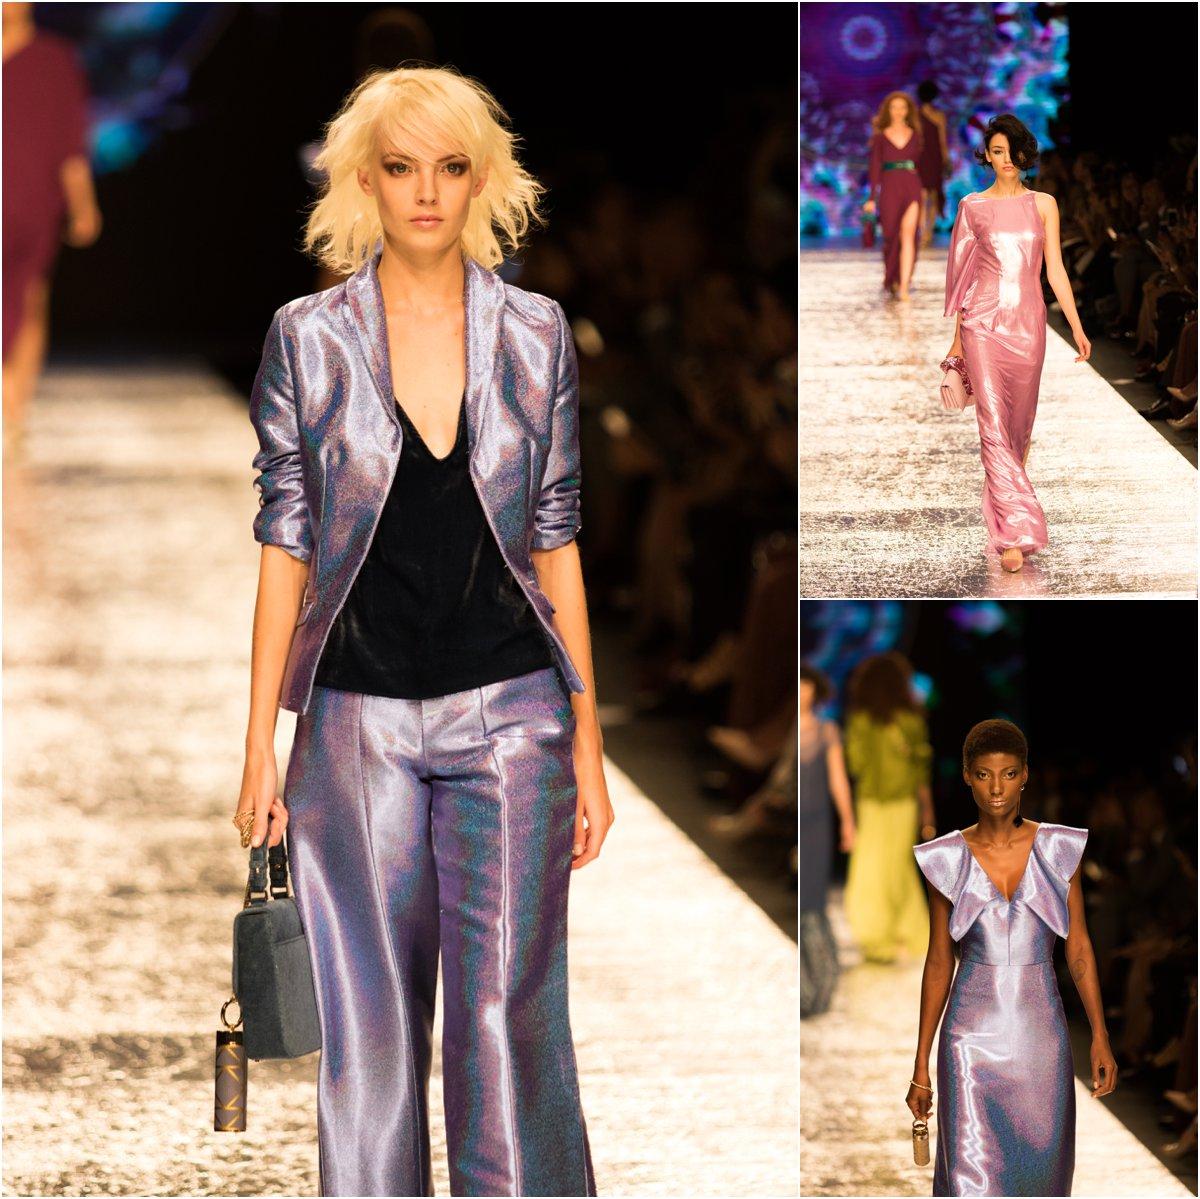 aigner-shimmer-taffeta-fabric-spring-summer-17-milan-fashion-week